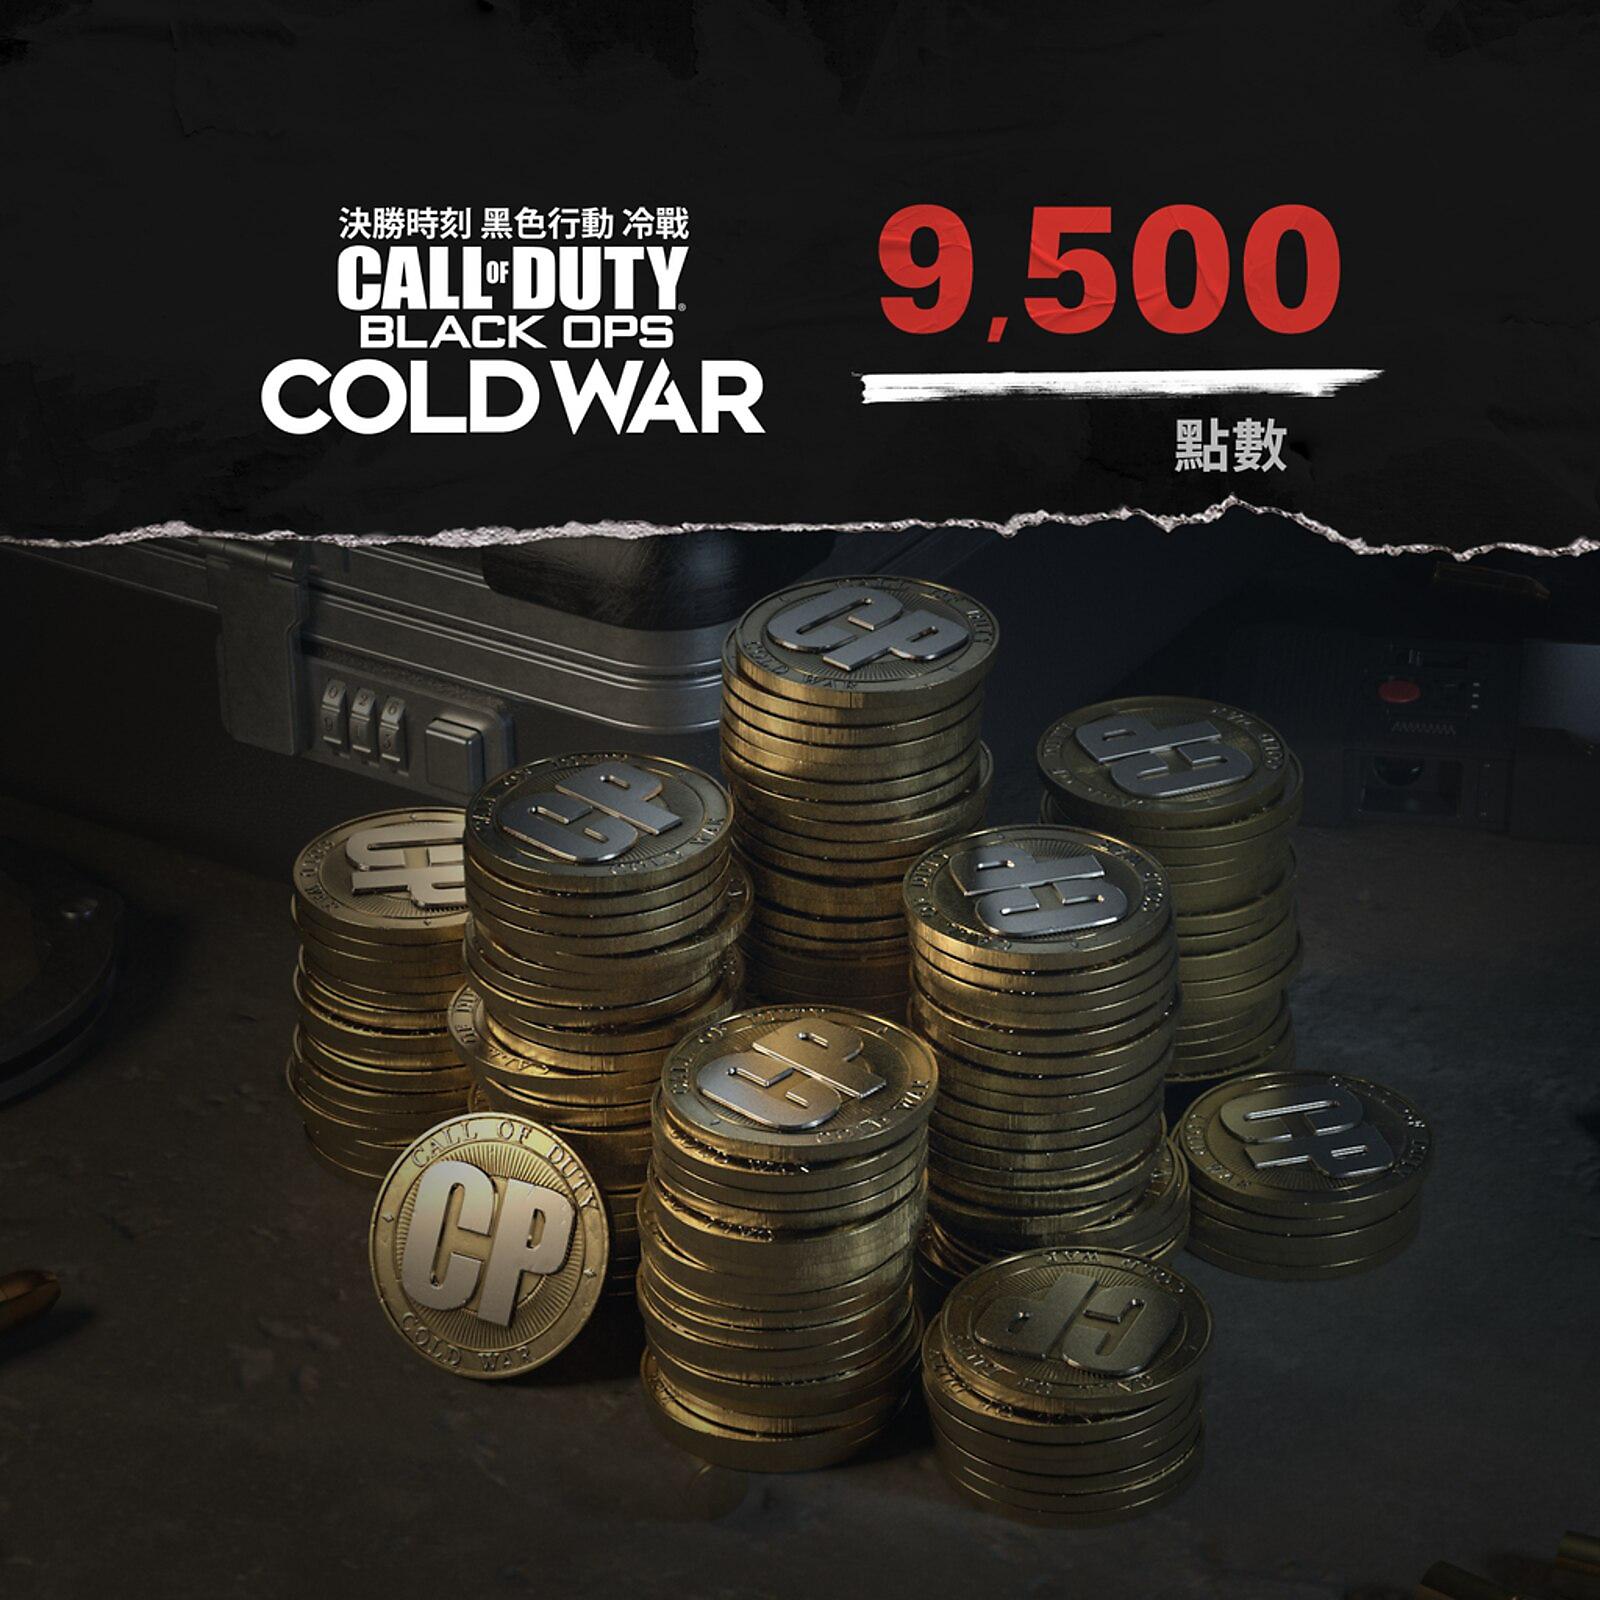 Call of Duty Black Ops Cold War points 9500 packshot